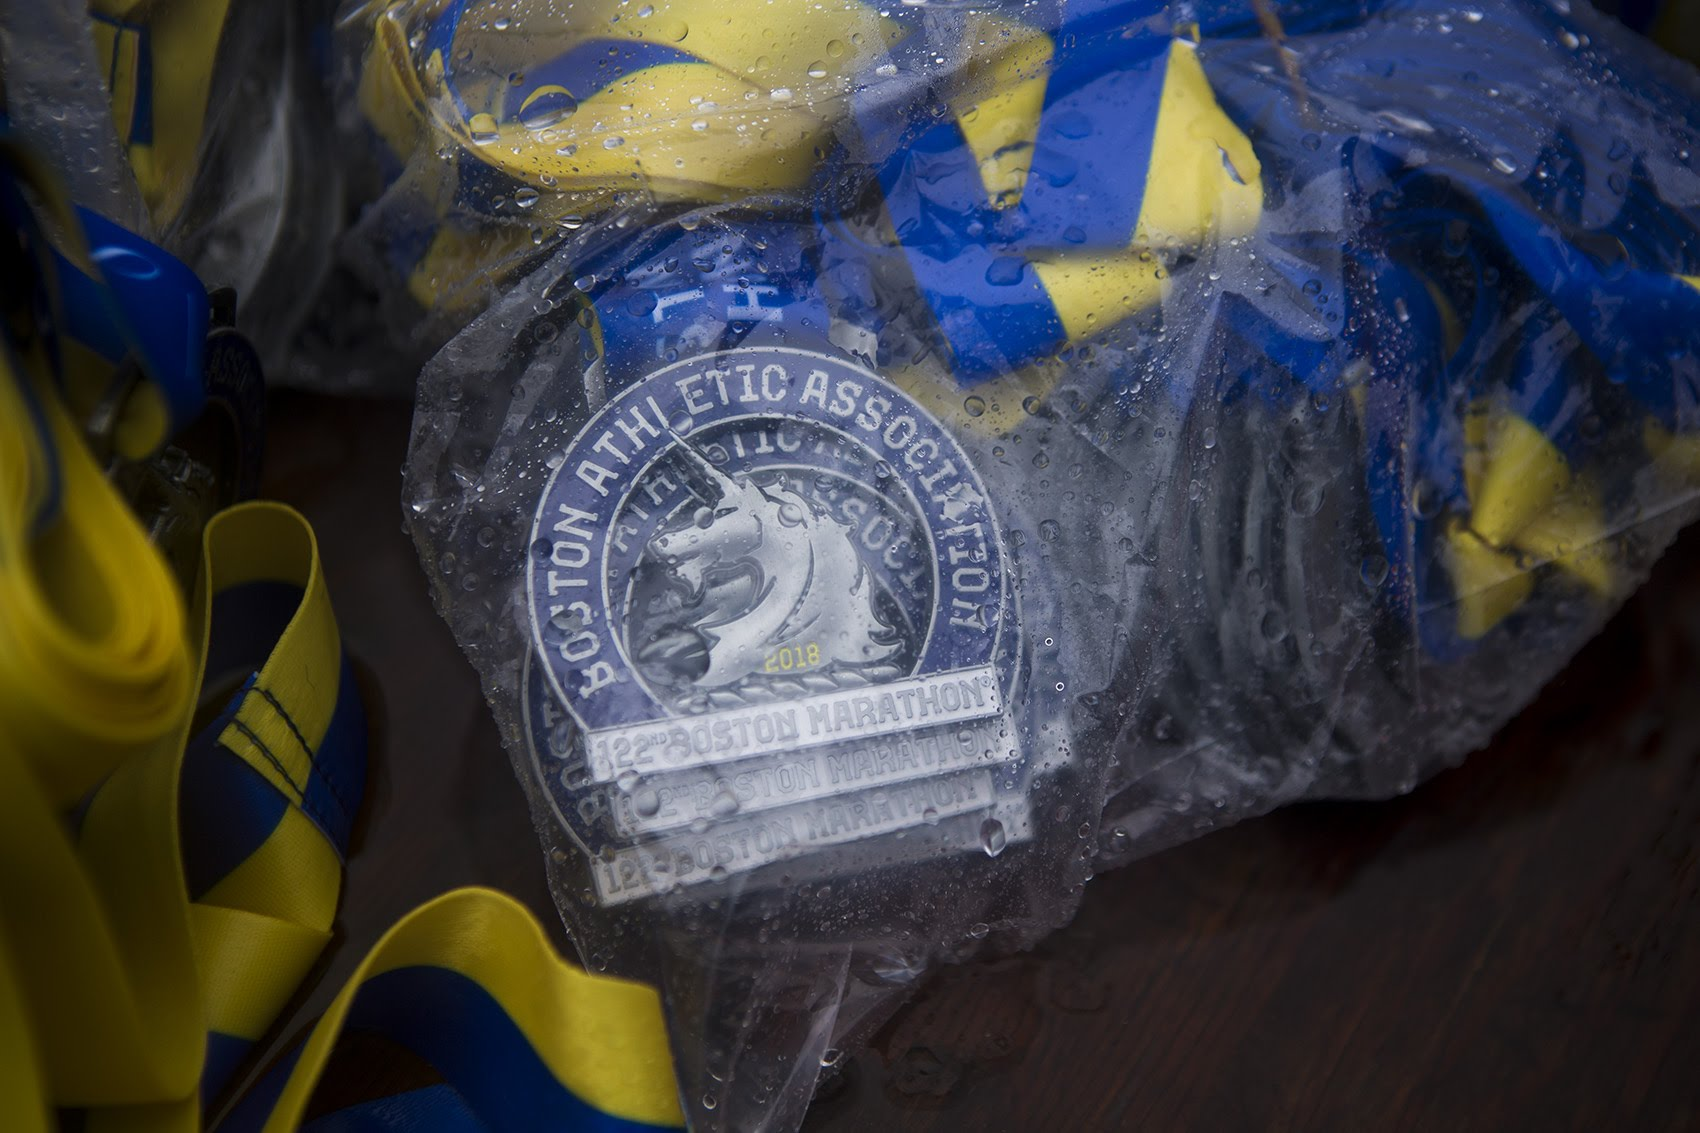 Image result for boston marathon 2018 rain